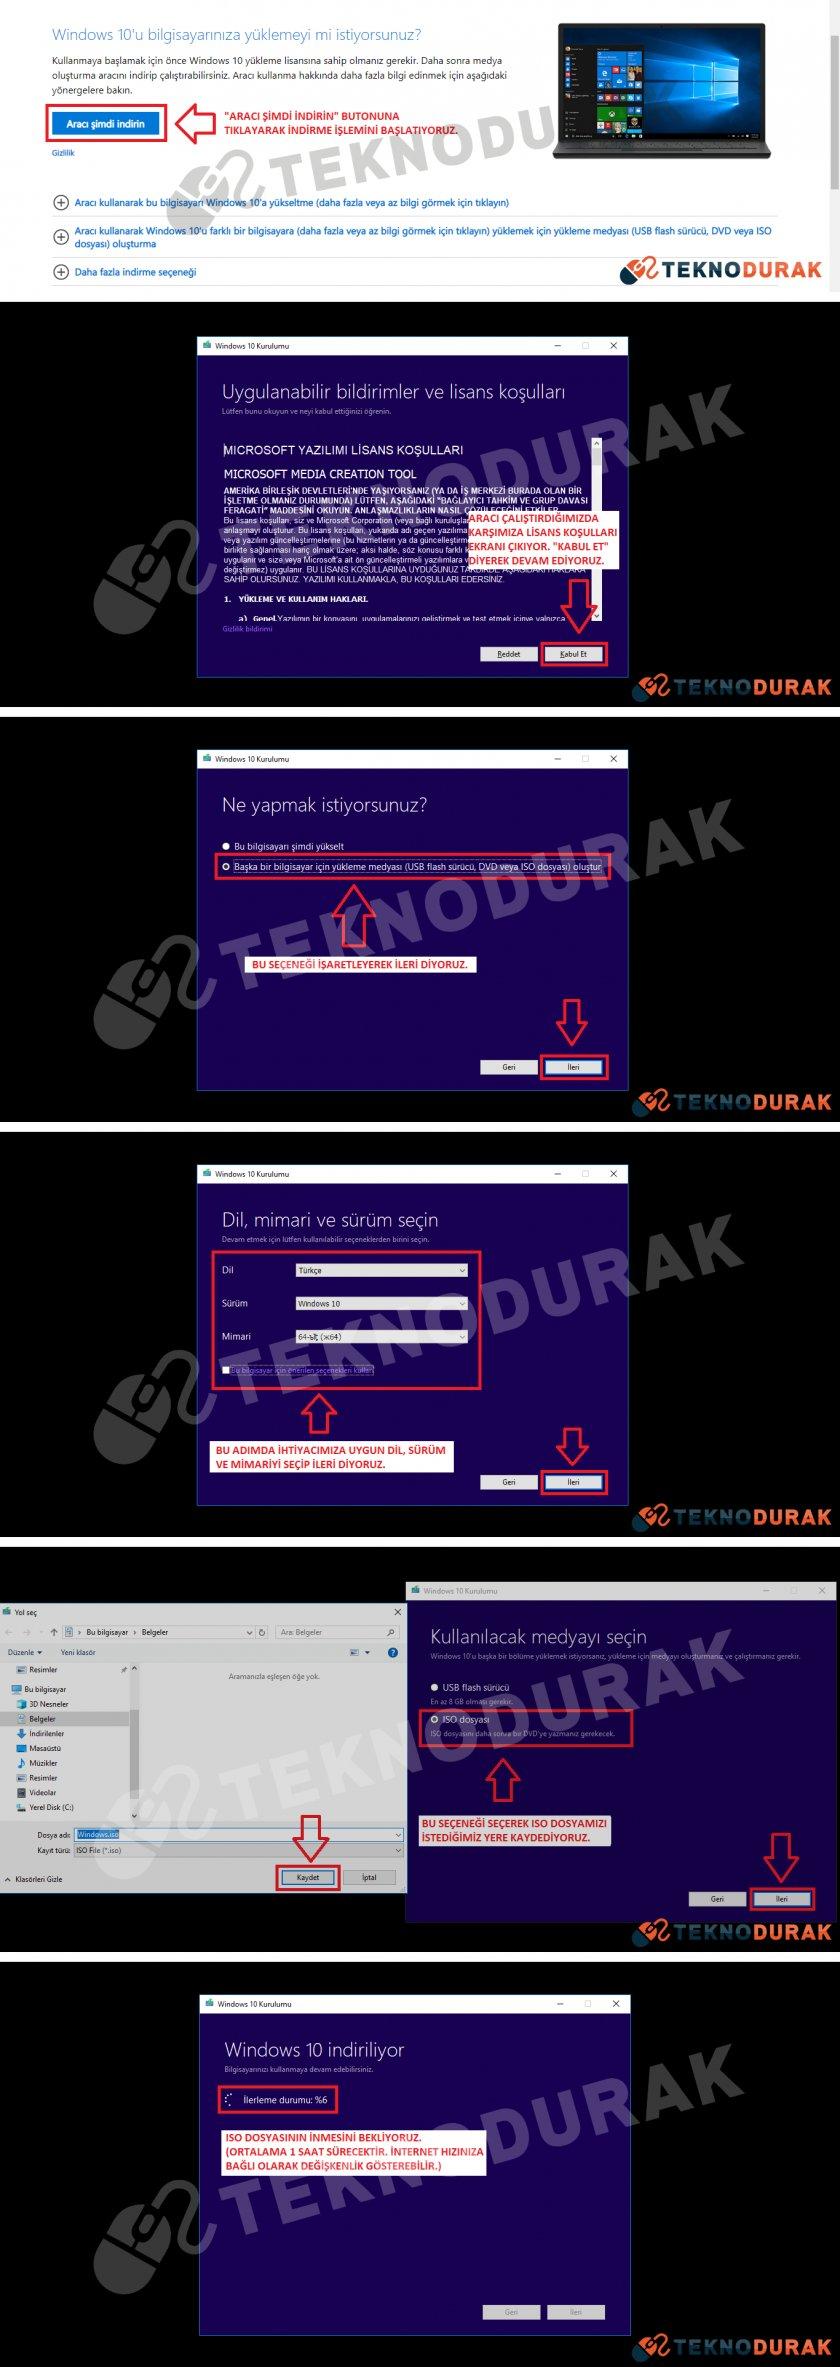 https://www.teknodurak.org/uploads/images/2019/01/windows-10-iso-dosyasi-indirme-7411360.jpg